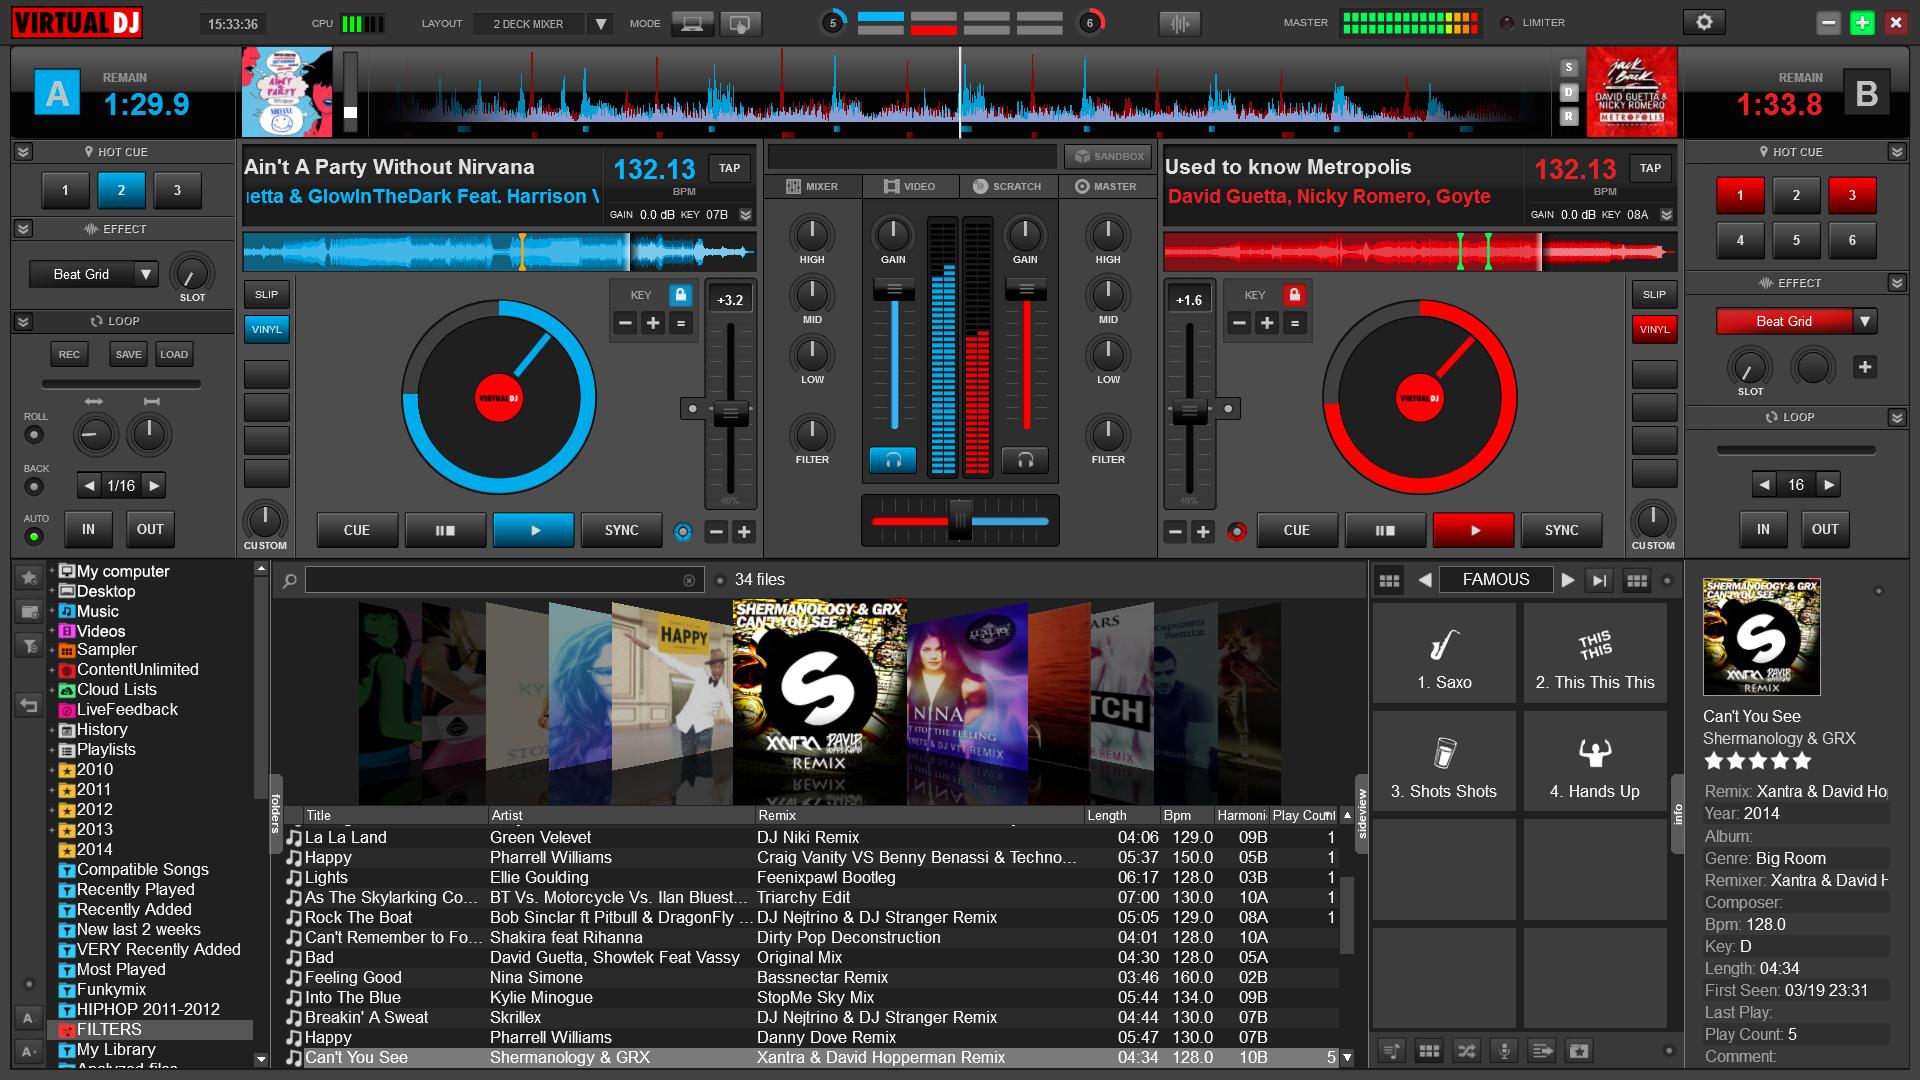 virtual-dj-mix-müzik-yapma